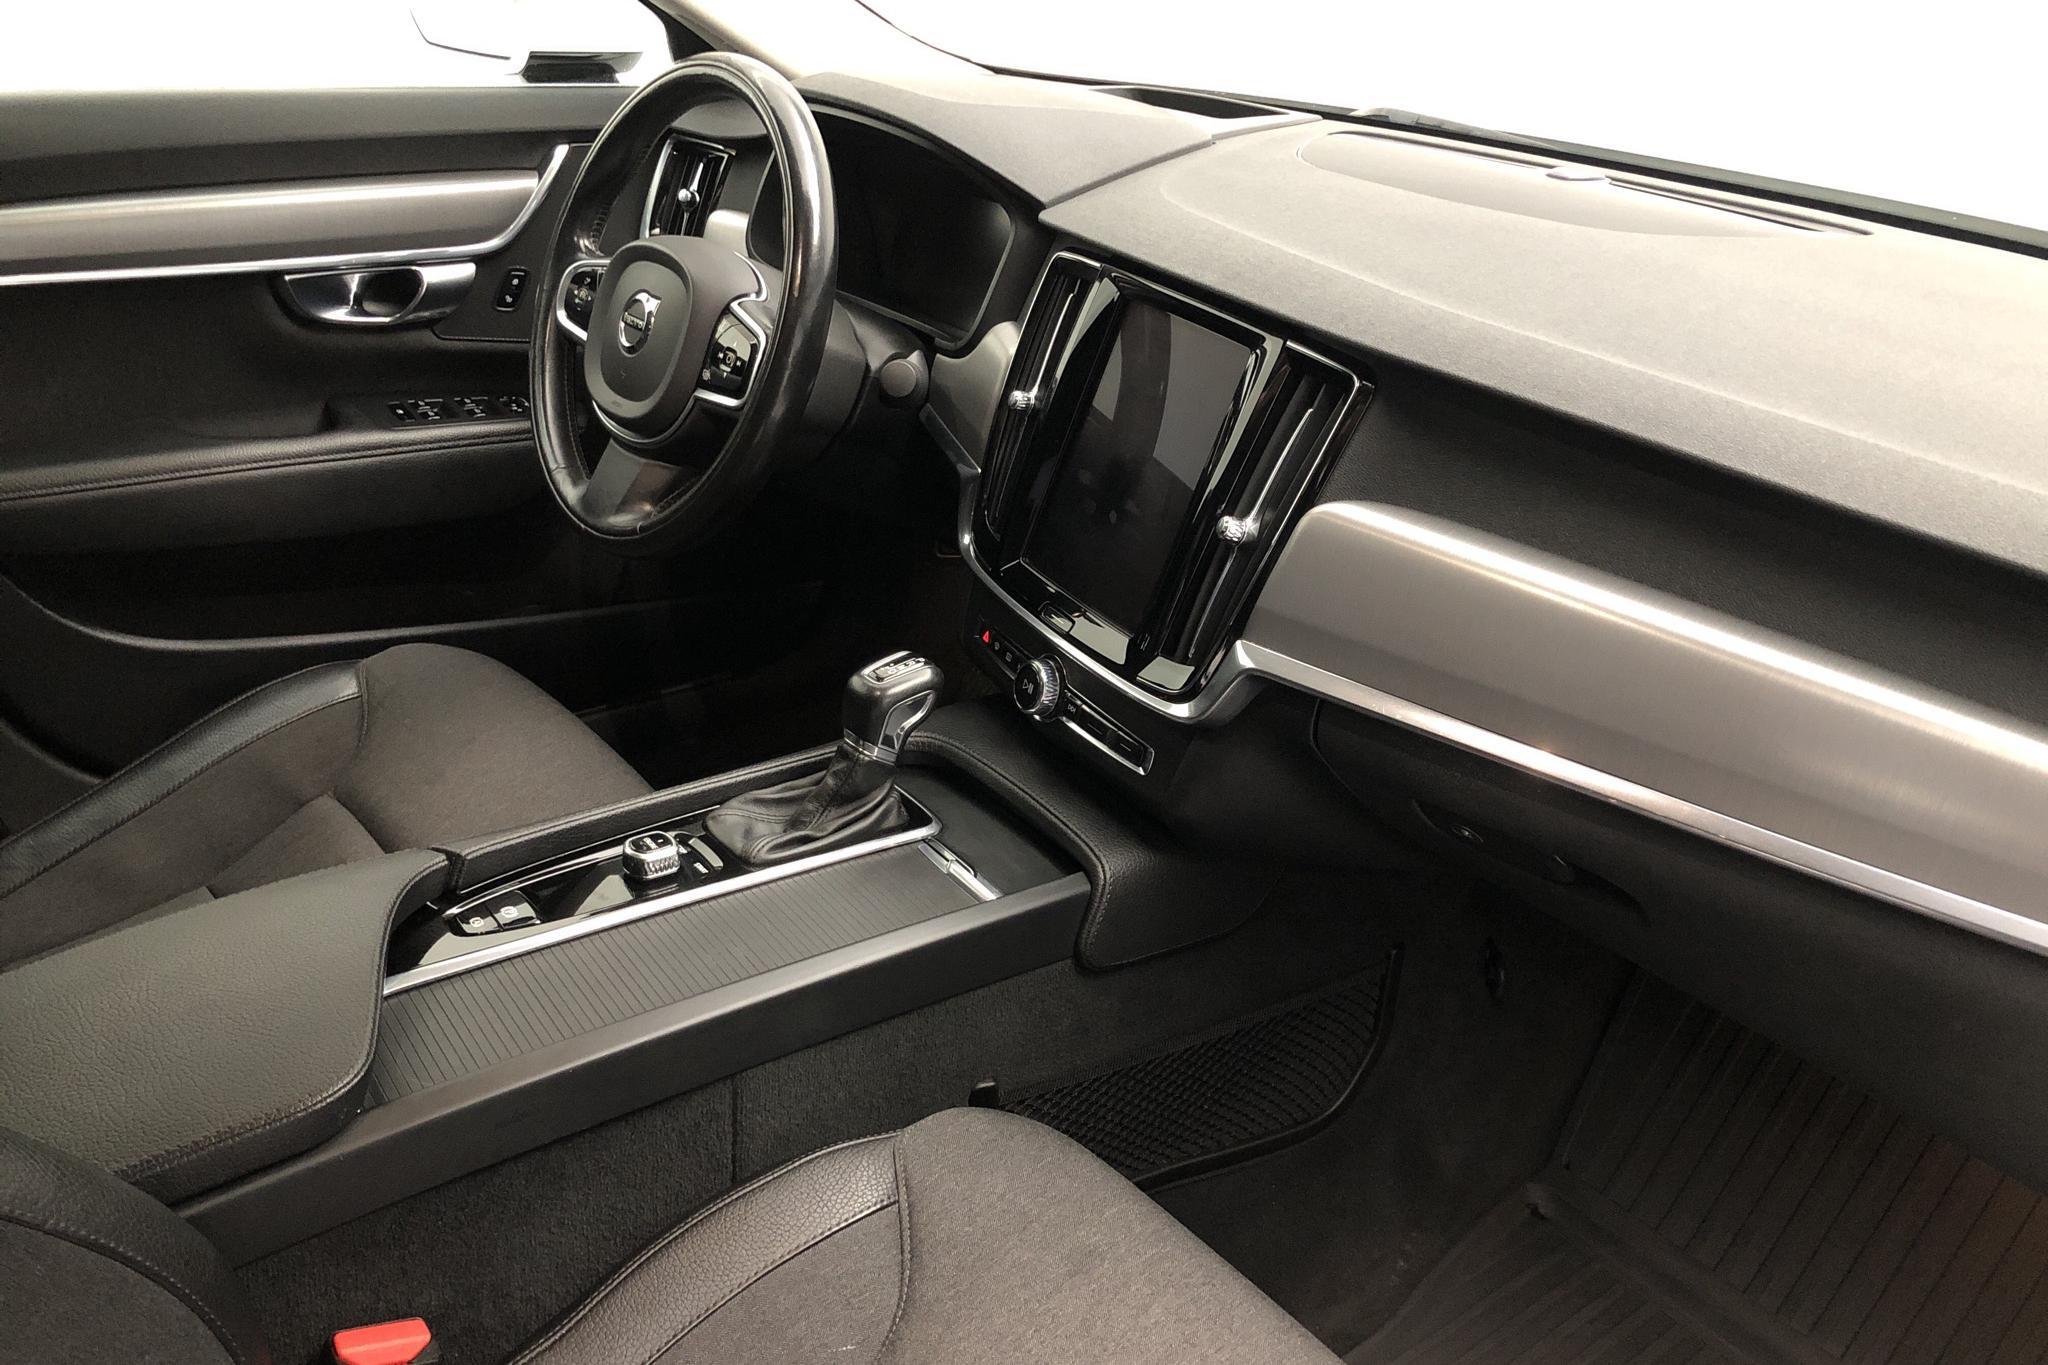 Volvo S90 D5 AWD (235hk) - 90 670 km - Automatic - white - 2017